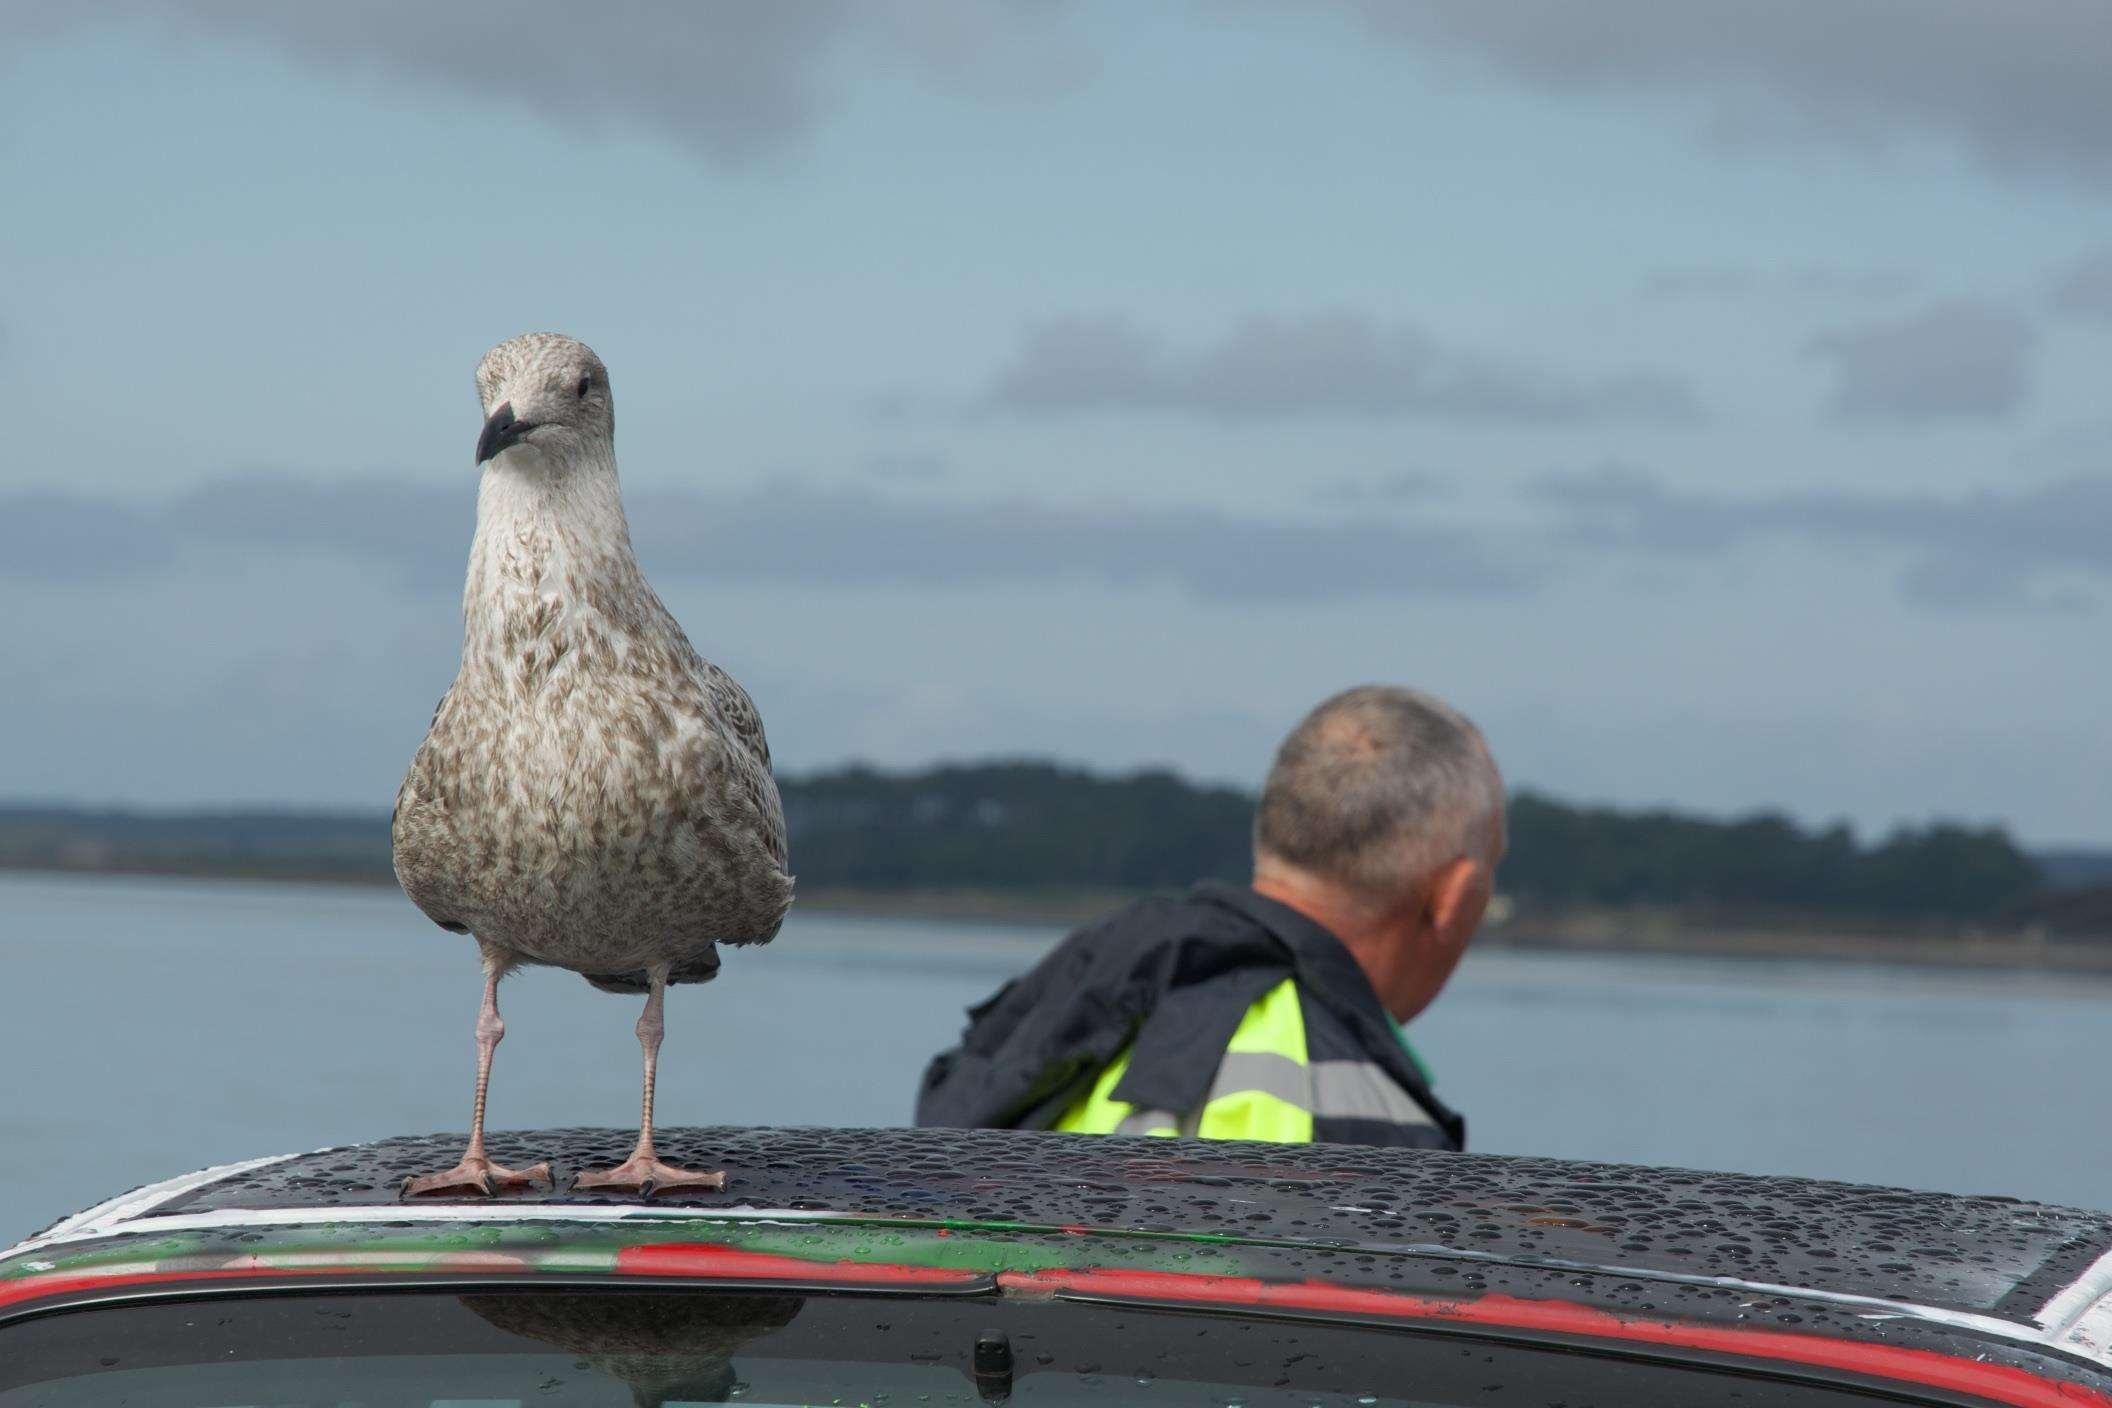 MY SUNDAY PHOTO - Seagull, 0FG 0505 Version 2%, uncategorised%